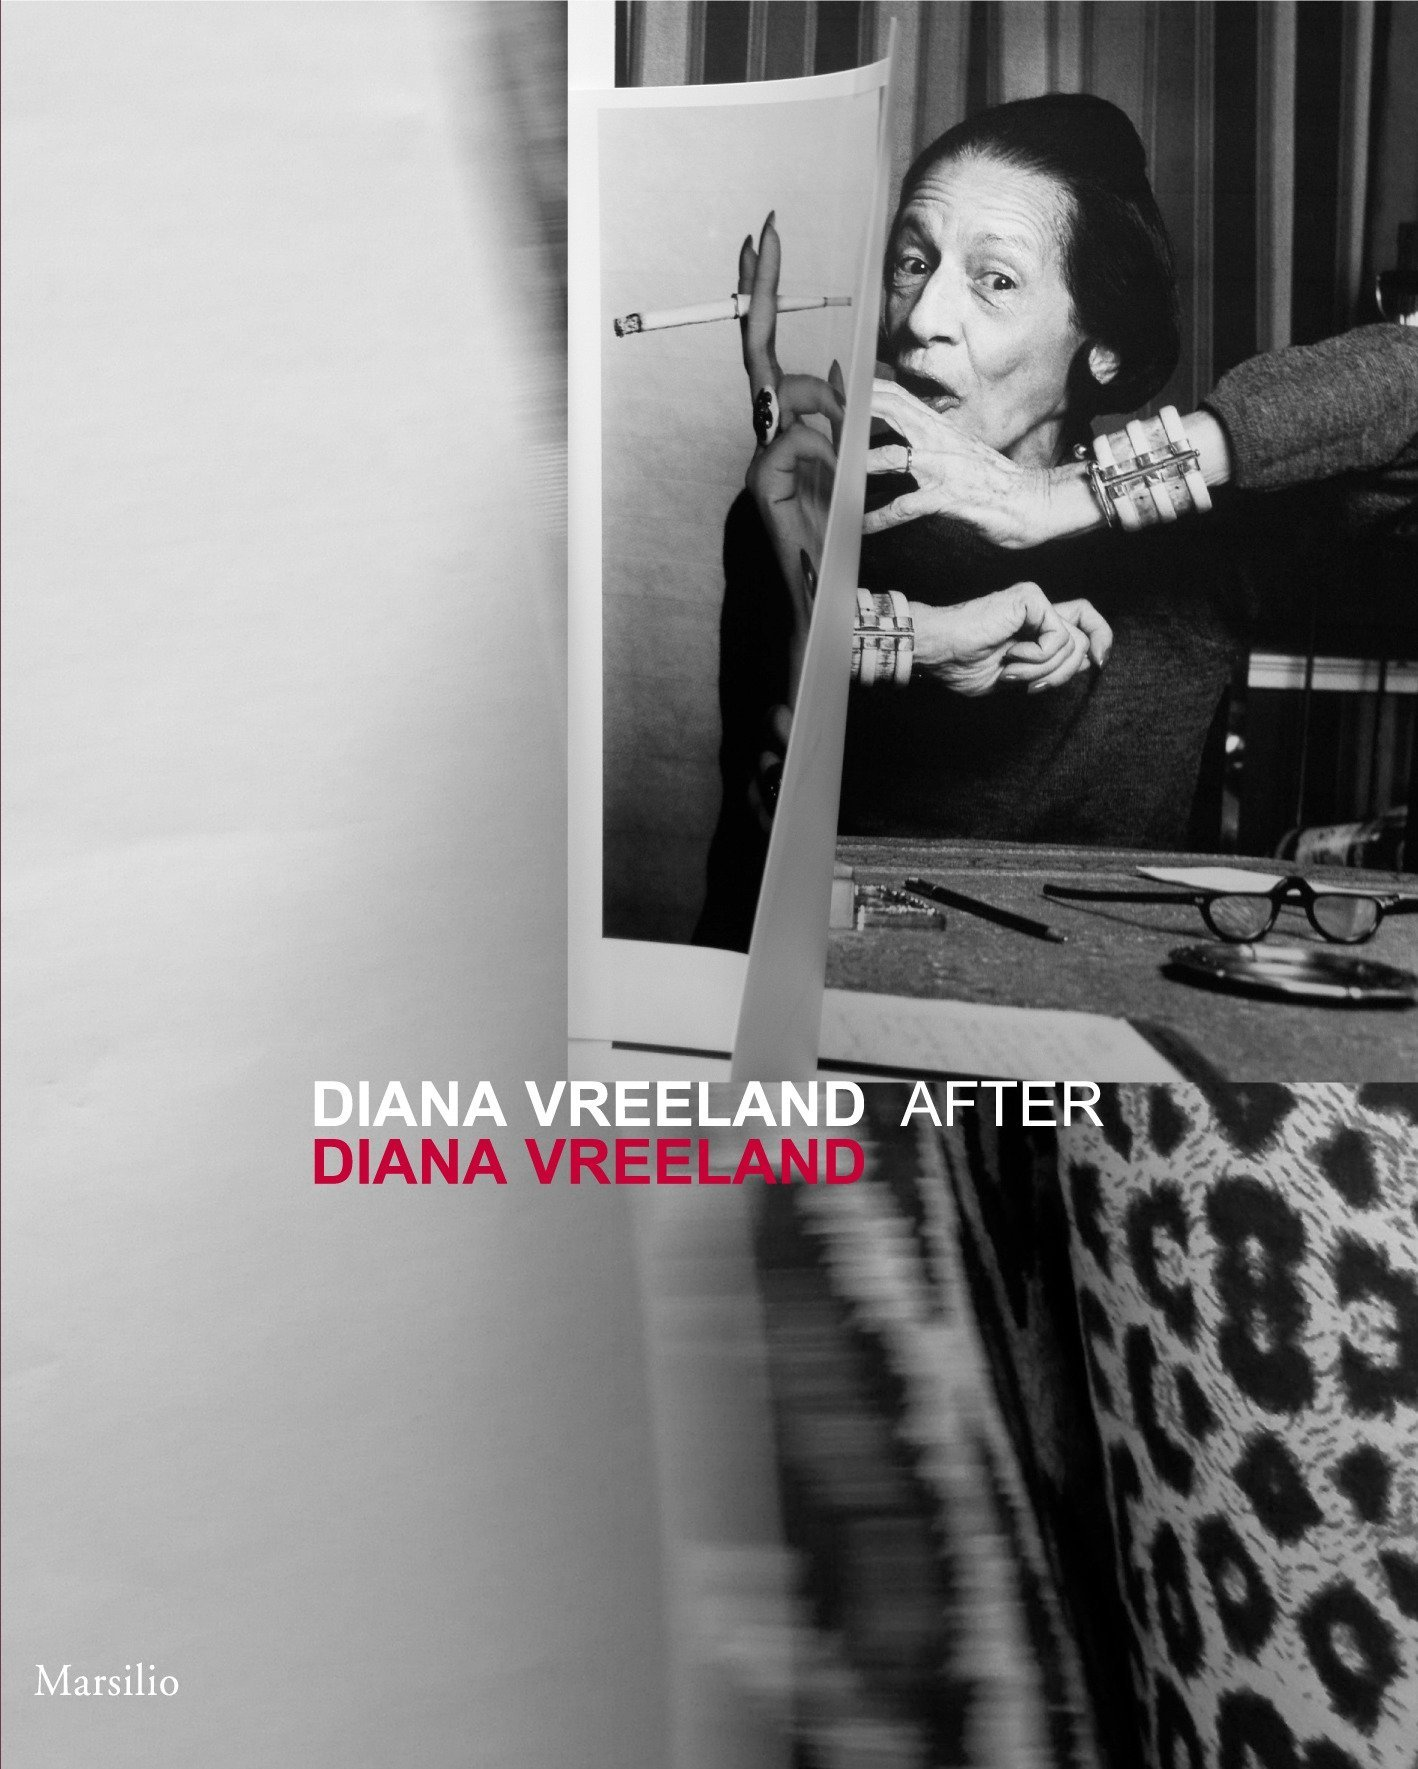 Diana Vreeland after Diana Vreeland by Brand: Marsilio